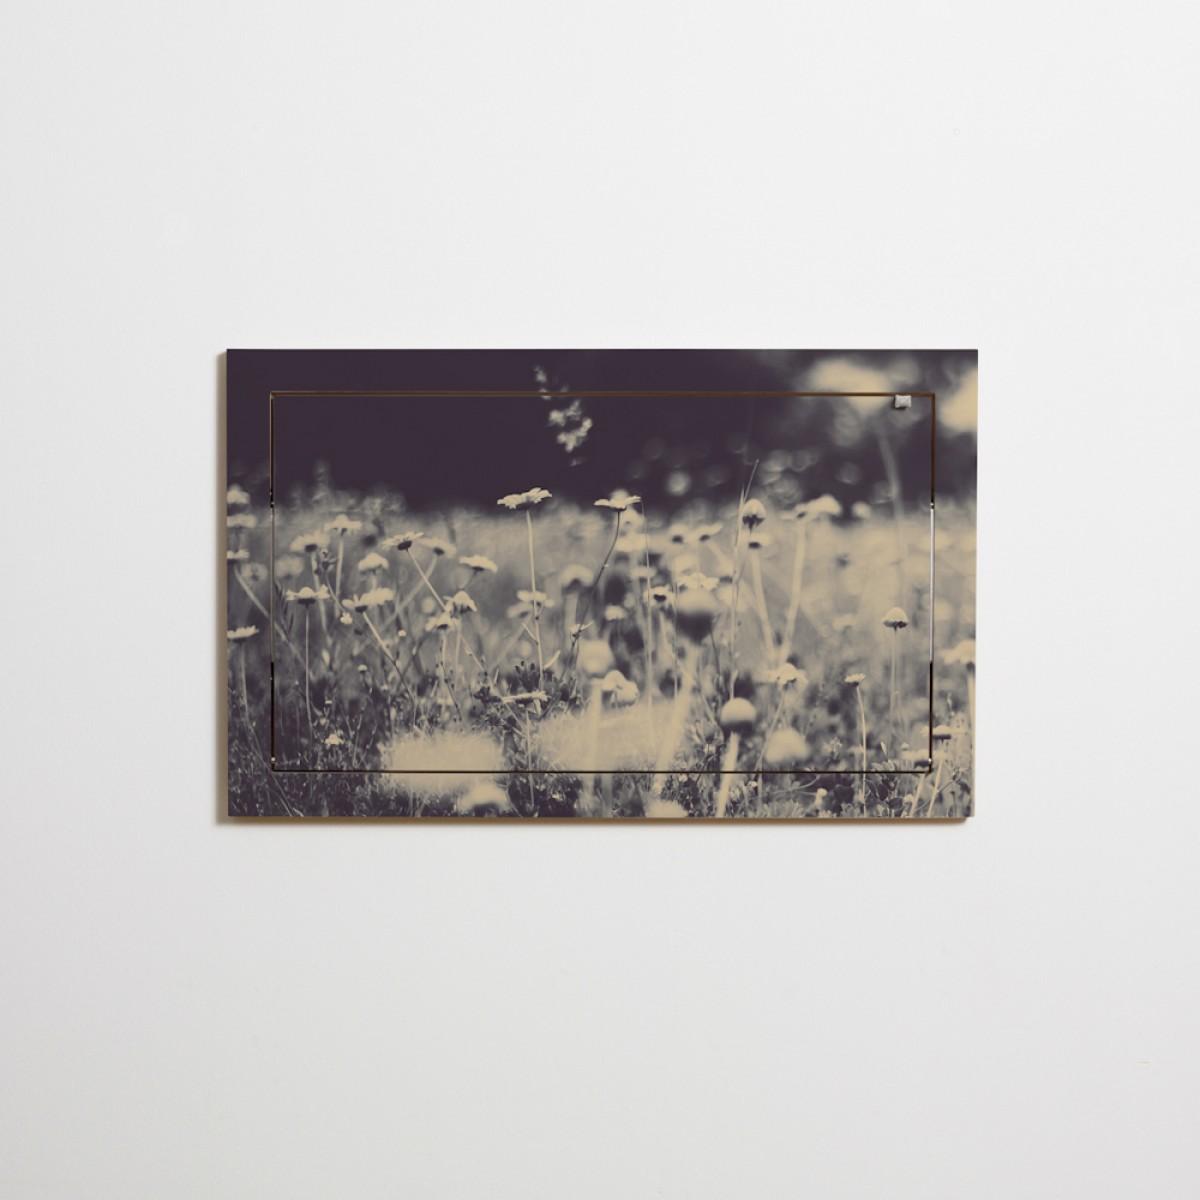 Fläpps Sekretär/in – Wild and Free by Ingrid Beddoes